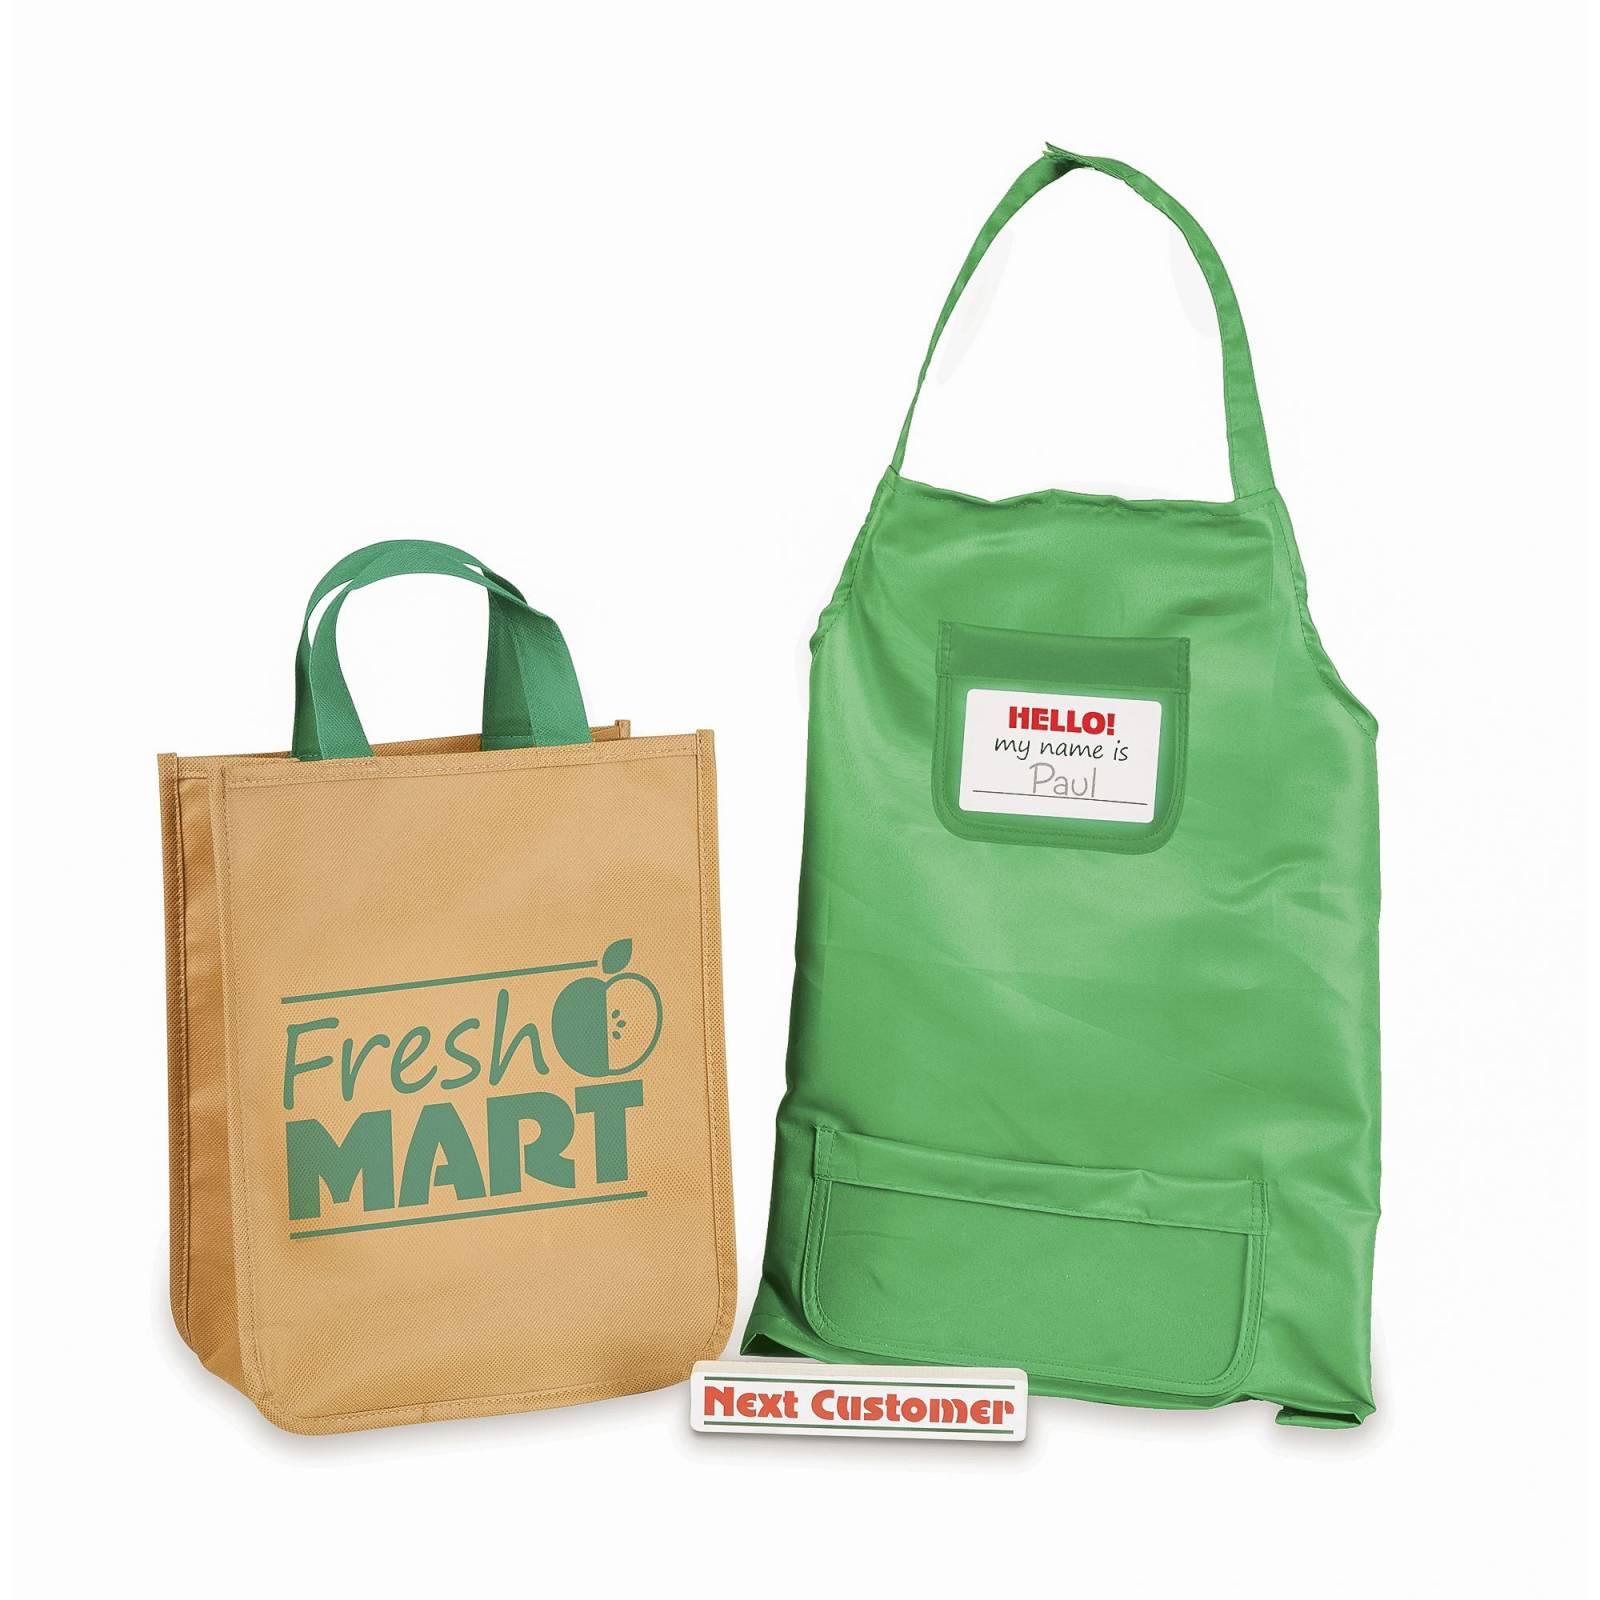 Fresh Mart Grocery Companion Set By Melissa & Doug 3+ thumbnails